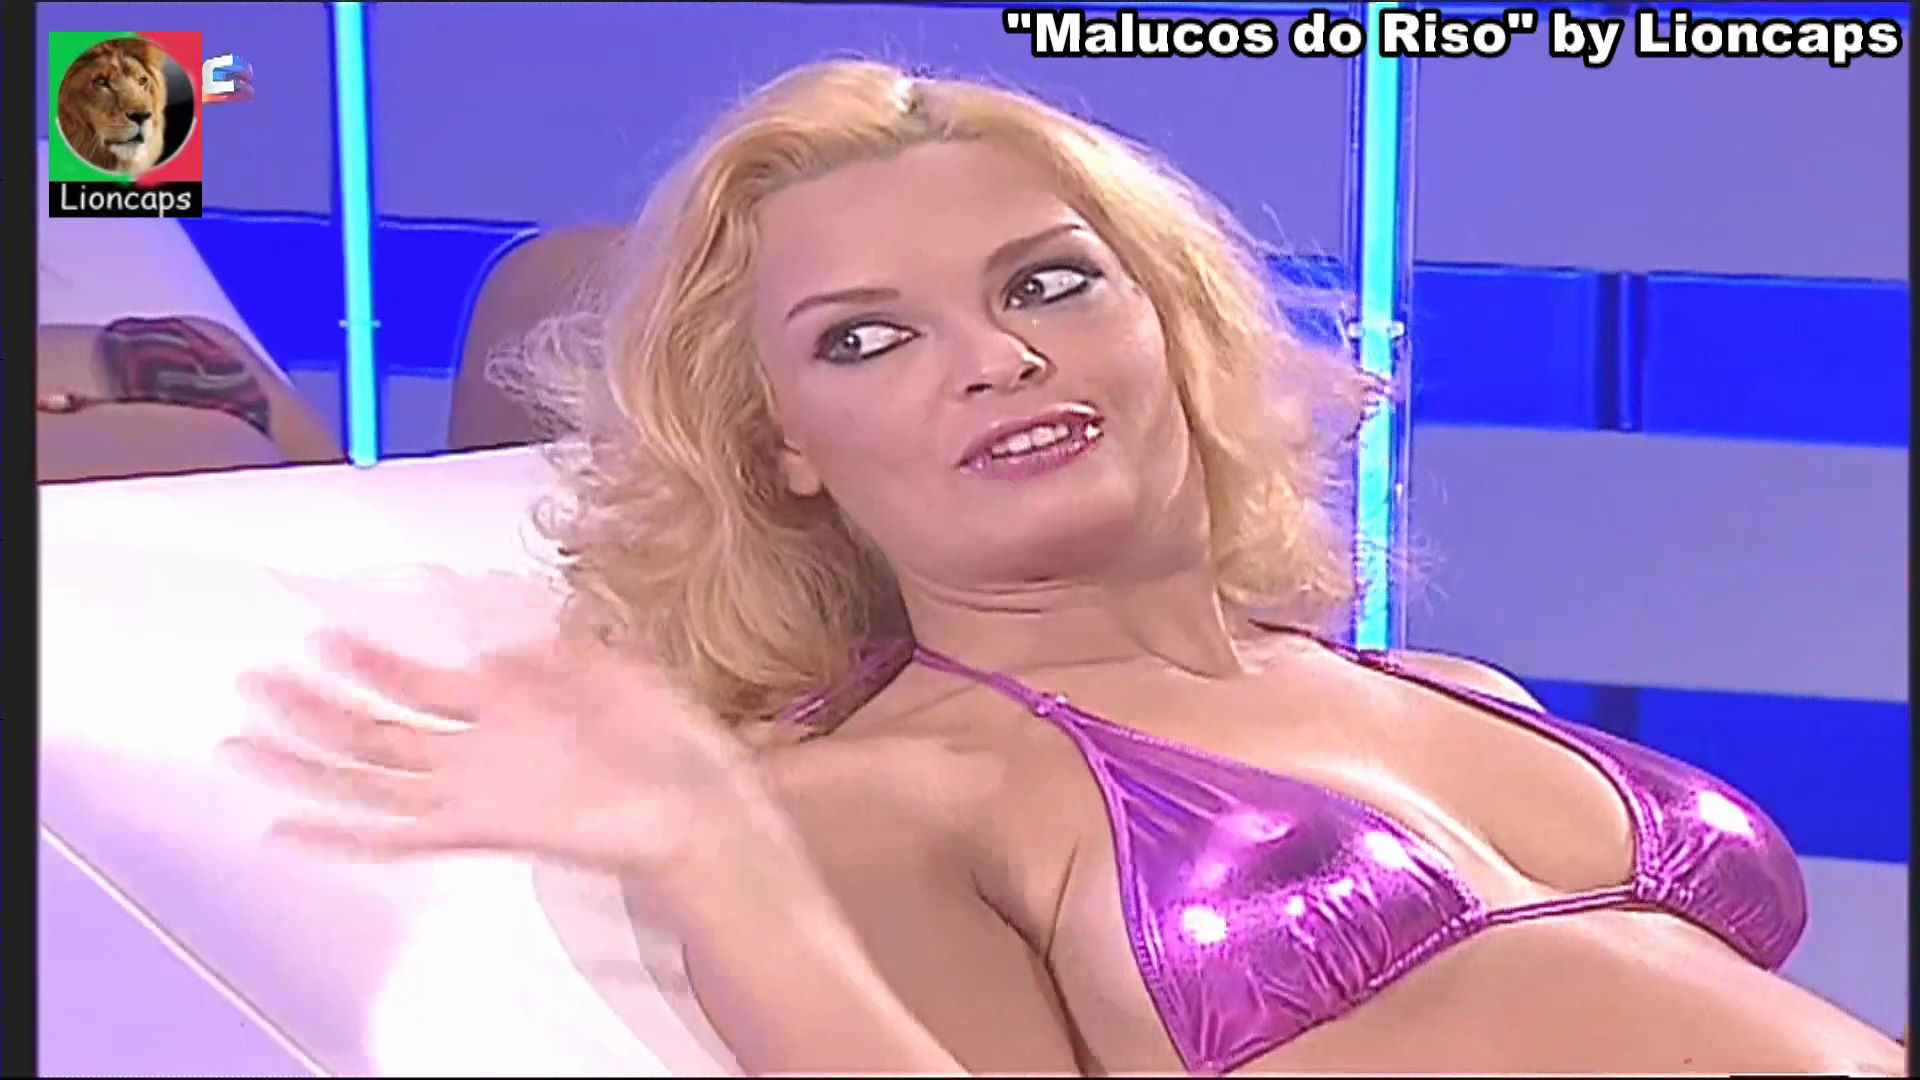 475076491_malucos_riso_alda_gomes_vs190malucos_riso_602_15016_122_354lo.JPG